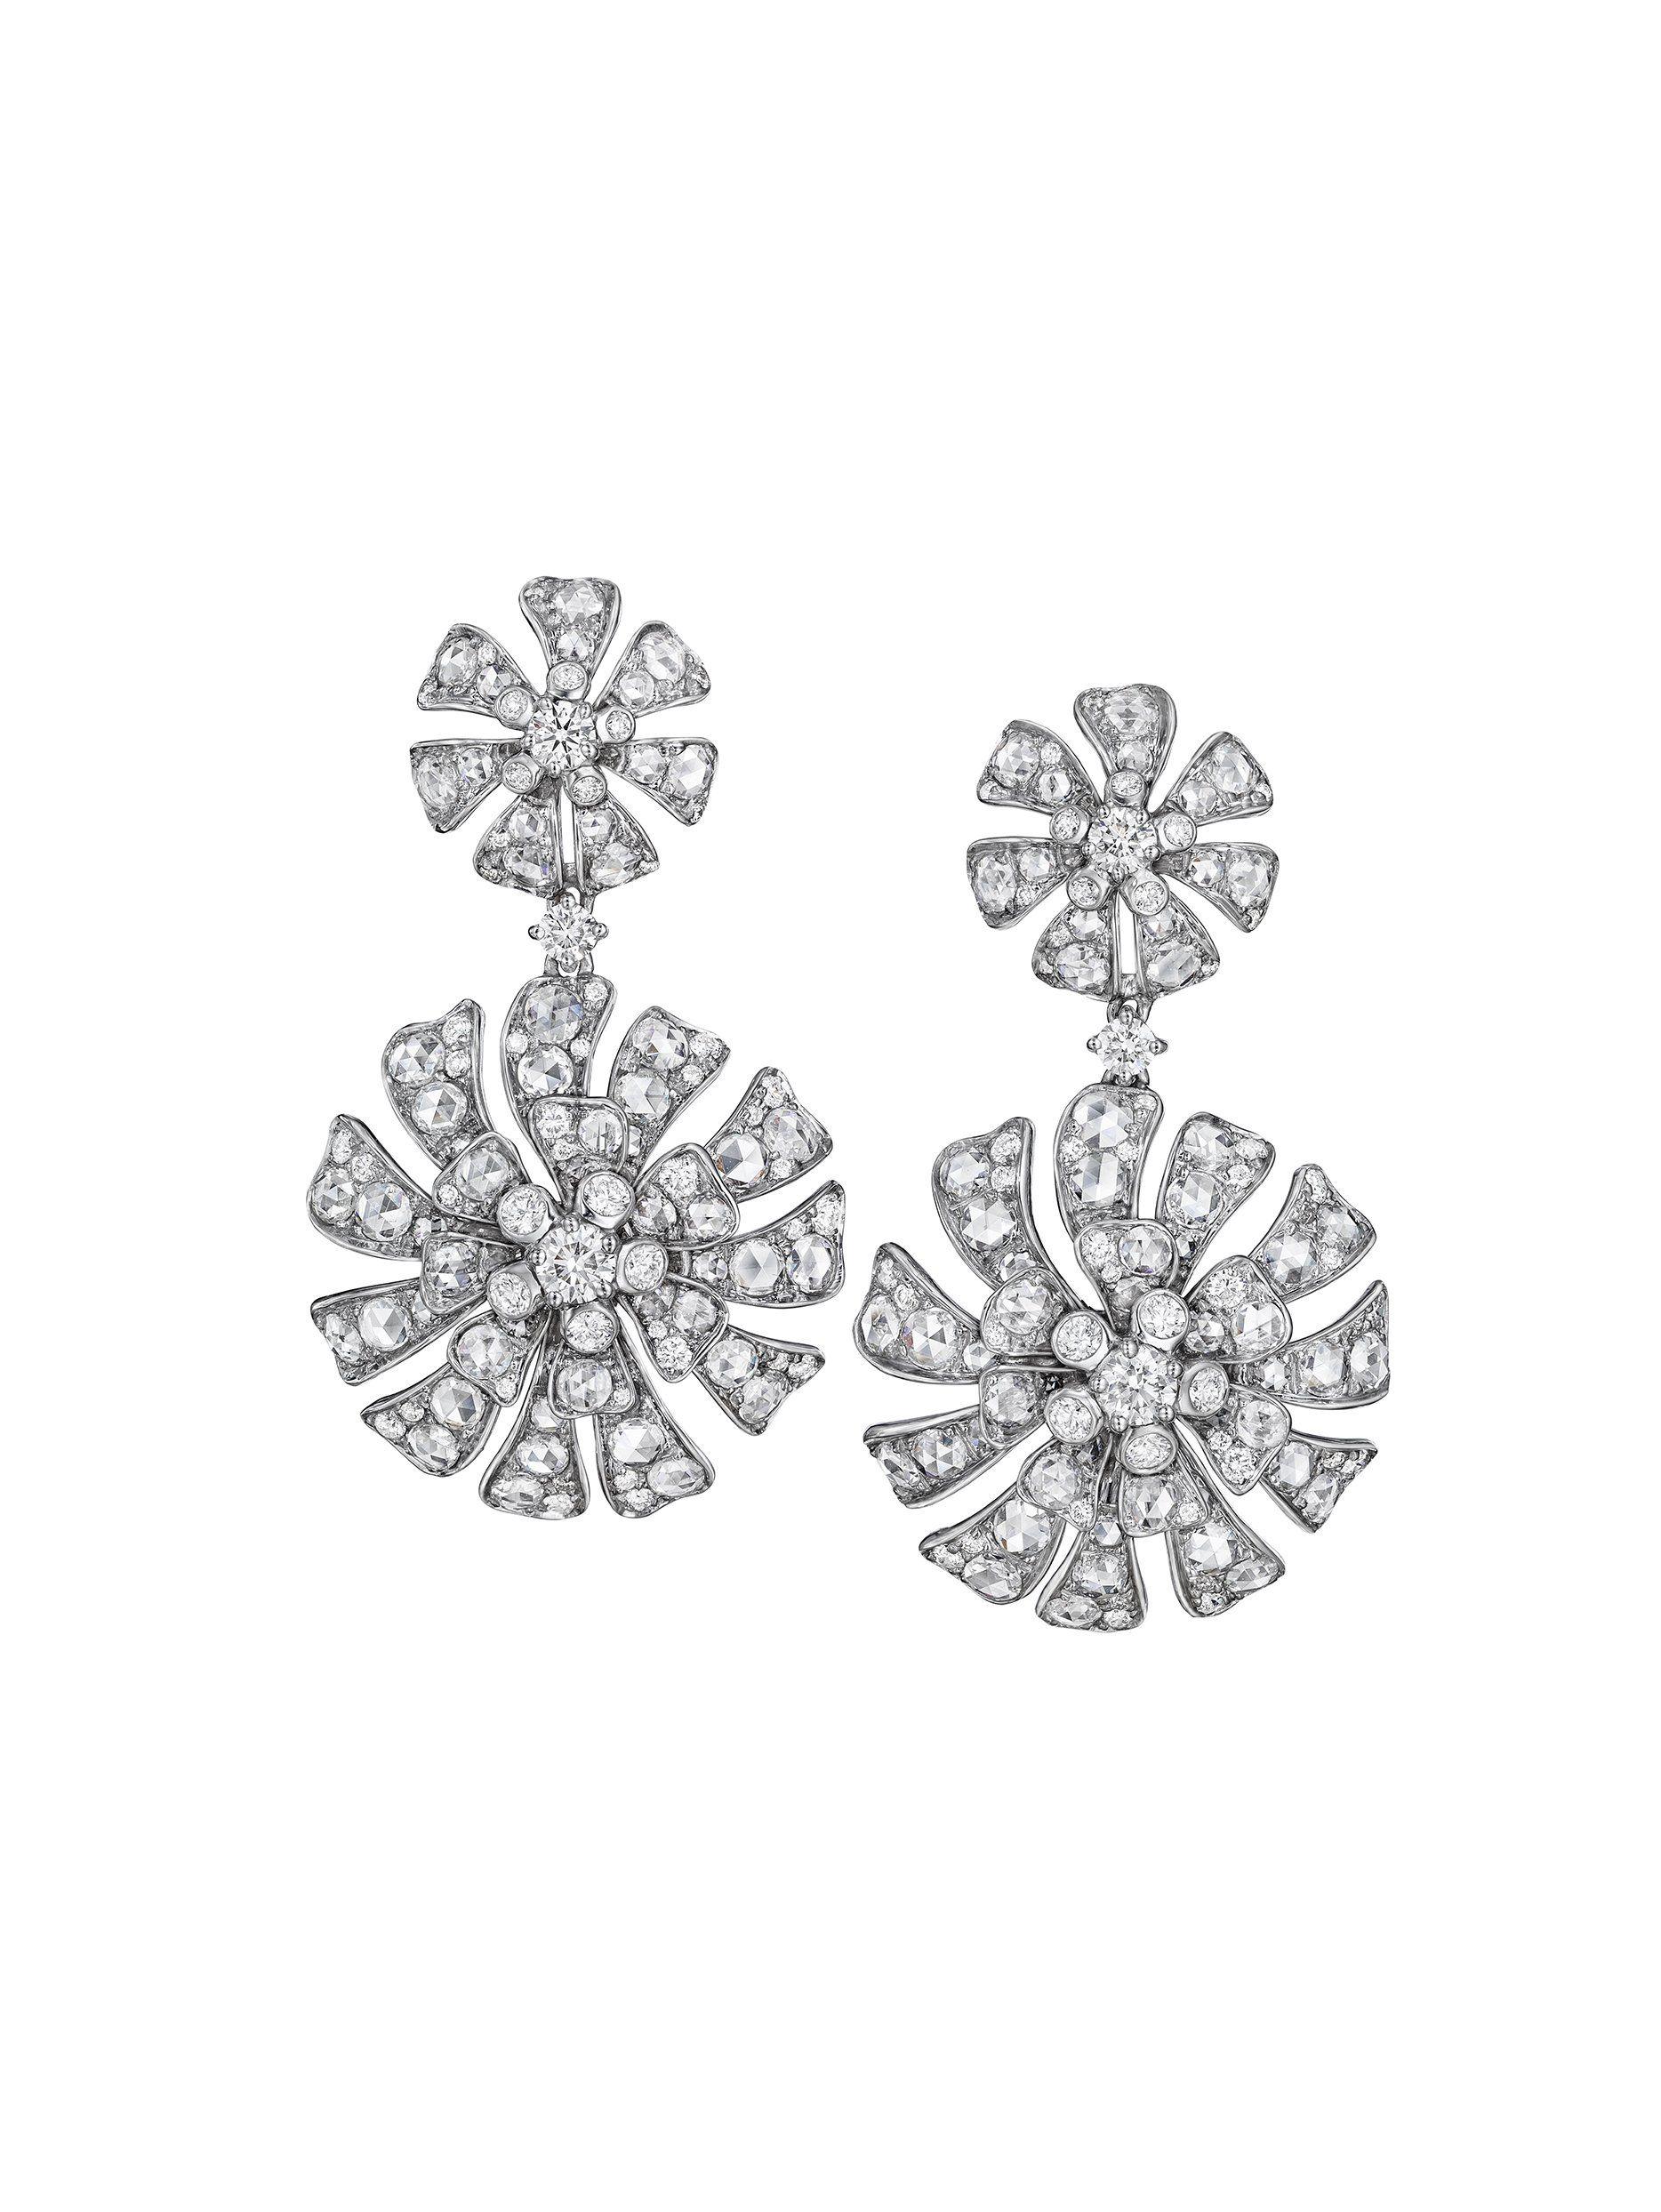 Aster Double Blossom Drop Earrings In 2020 Drop Earrings Large Earrings Earrings